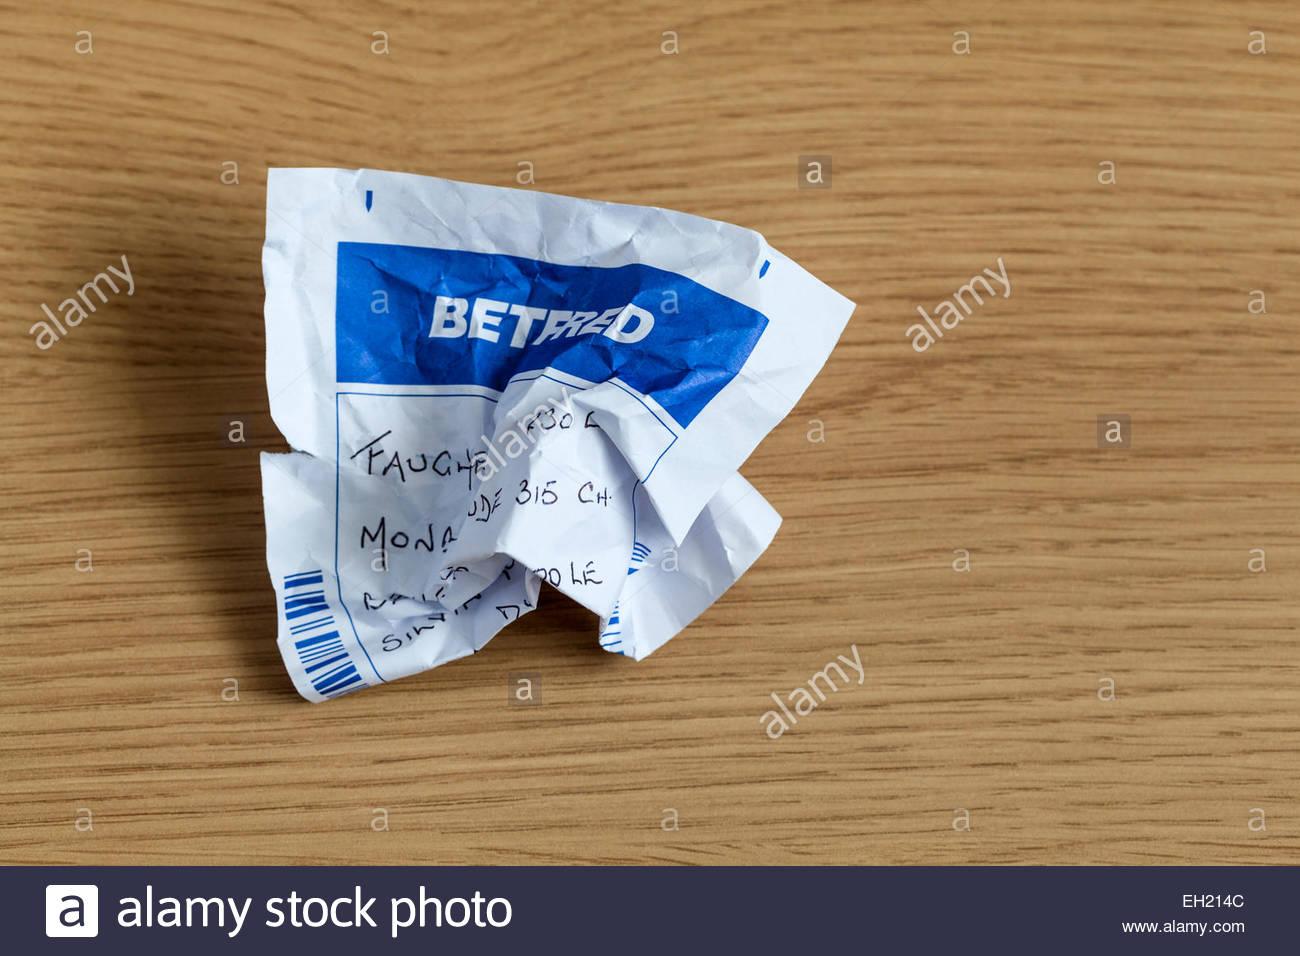 Screwed up betting slip - Stock Image